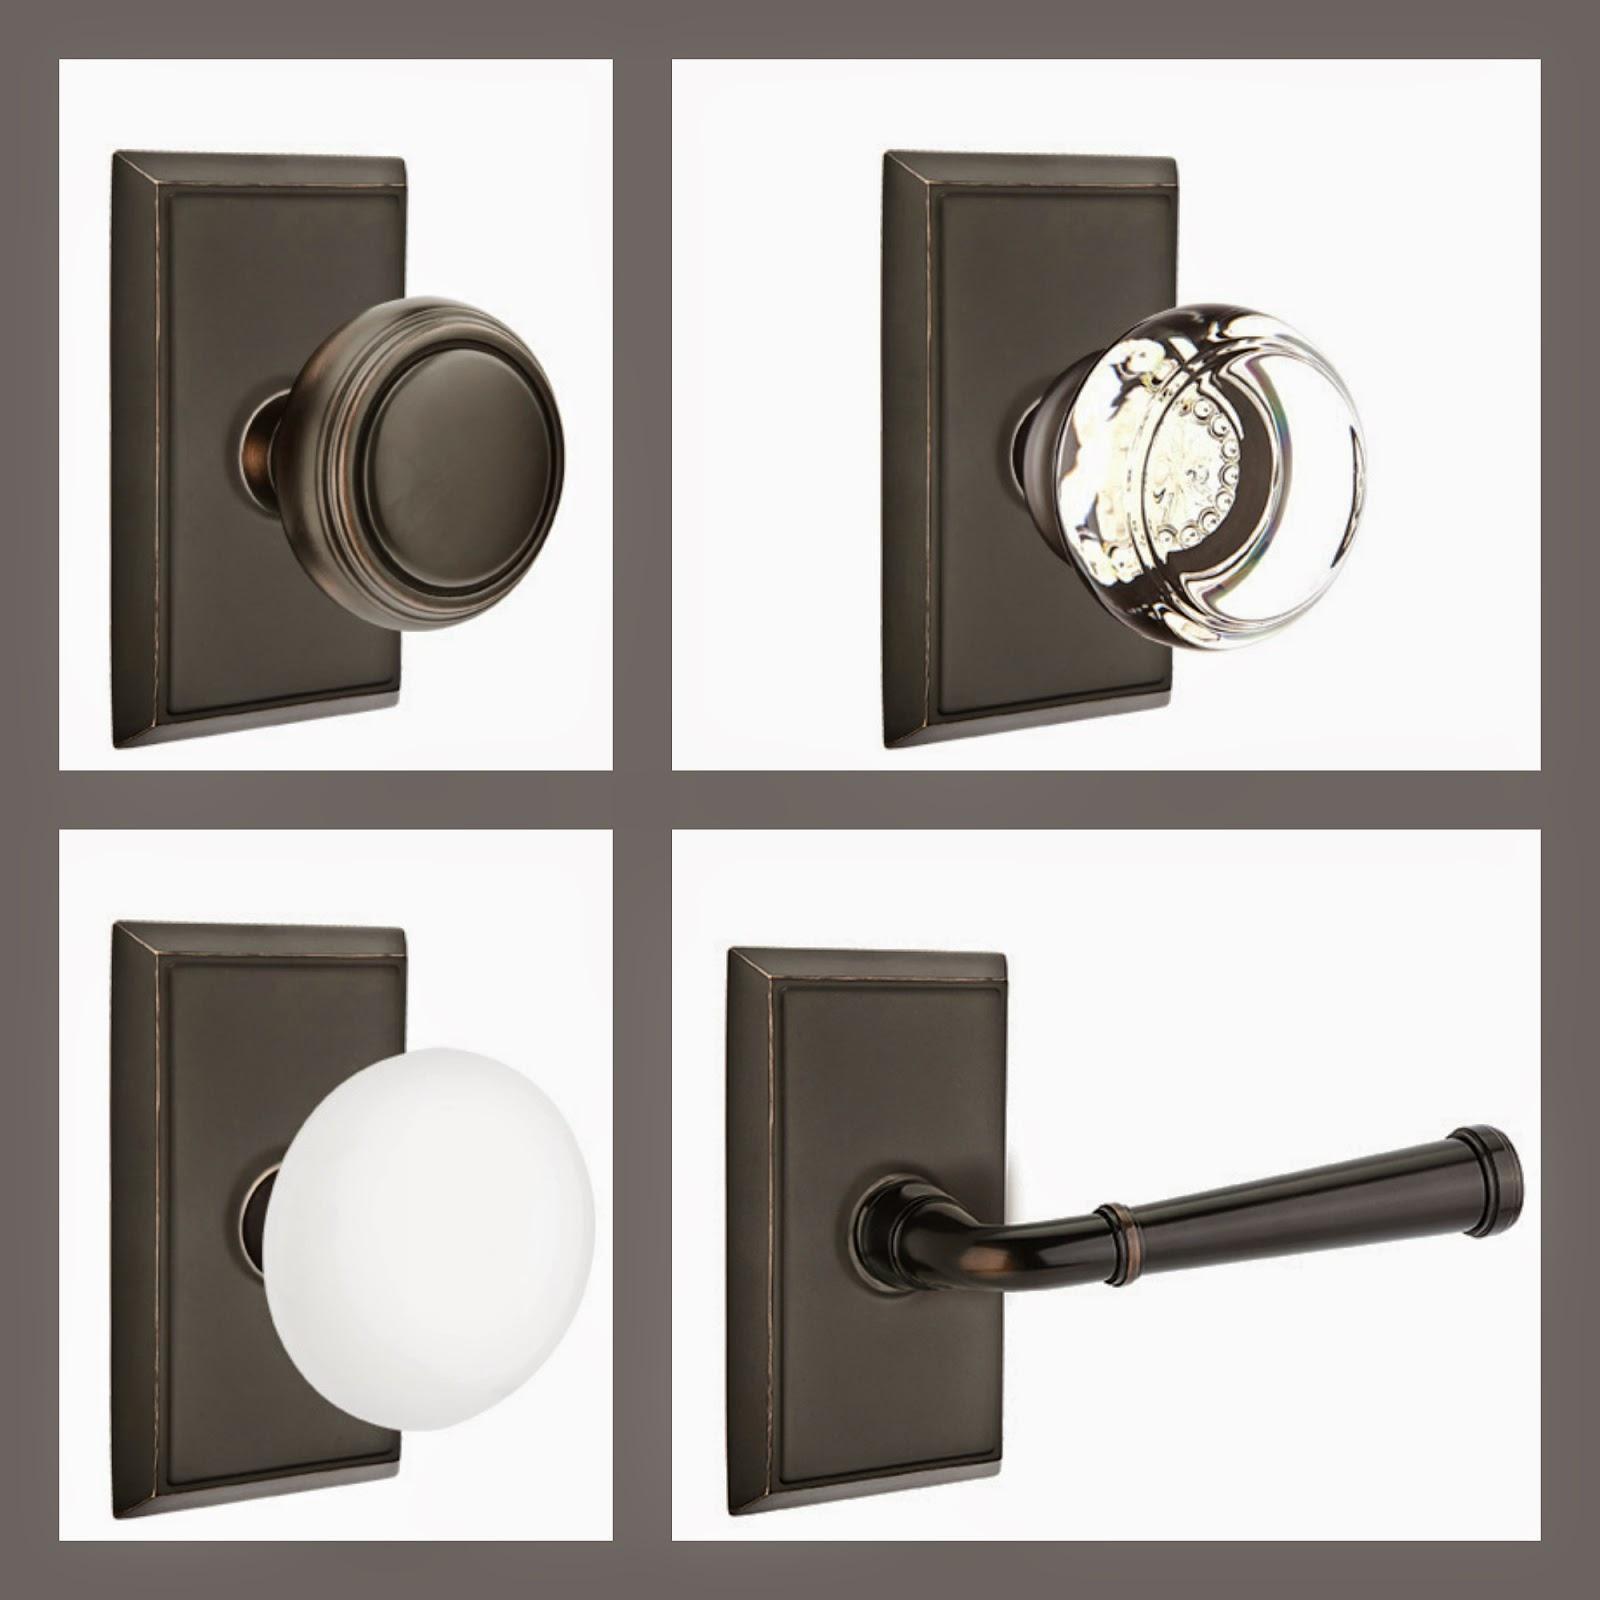 interior door knob photo - 15